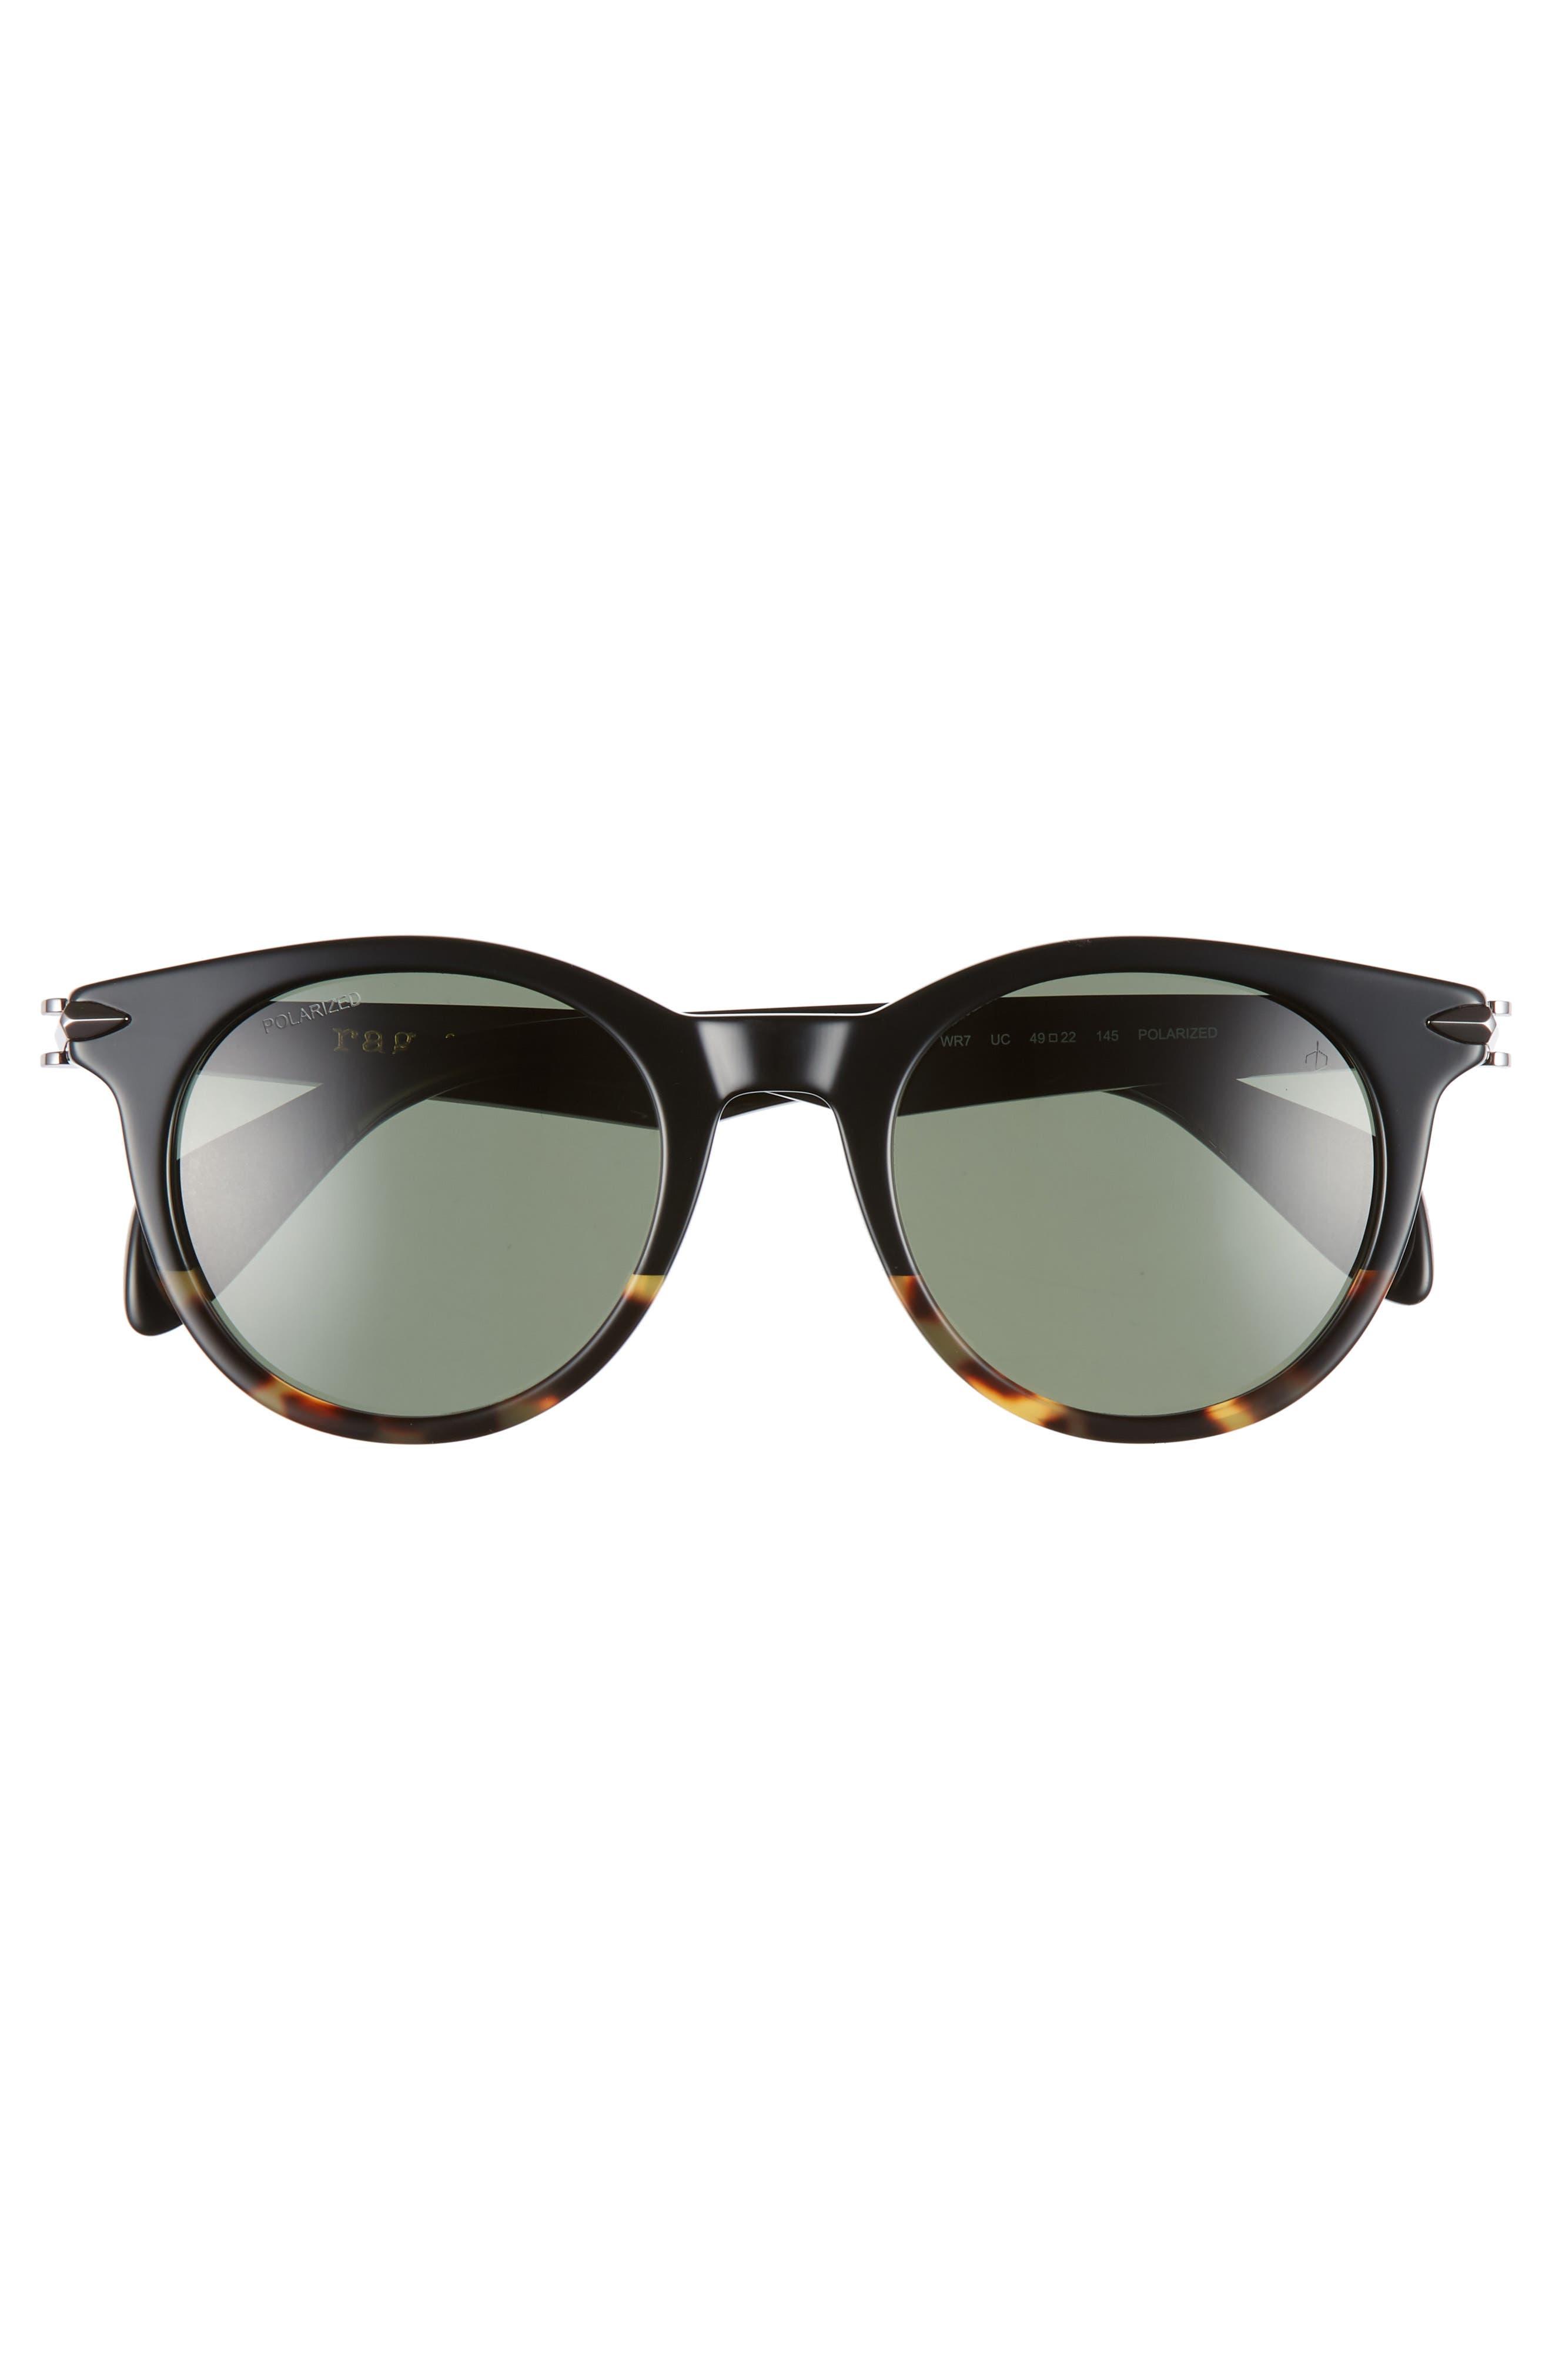 49mm Polarized Round Sunglasses,                             Alternate thumbnail 2, color,                             BLACK HAVANA